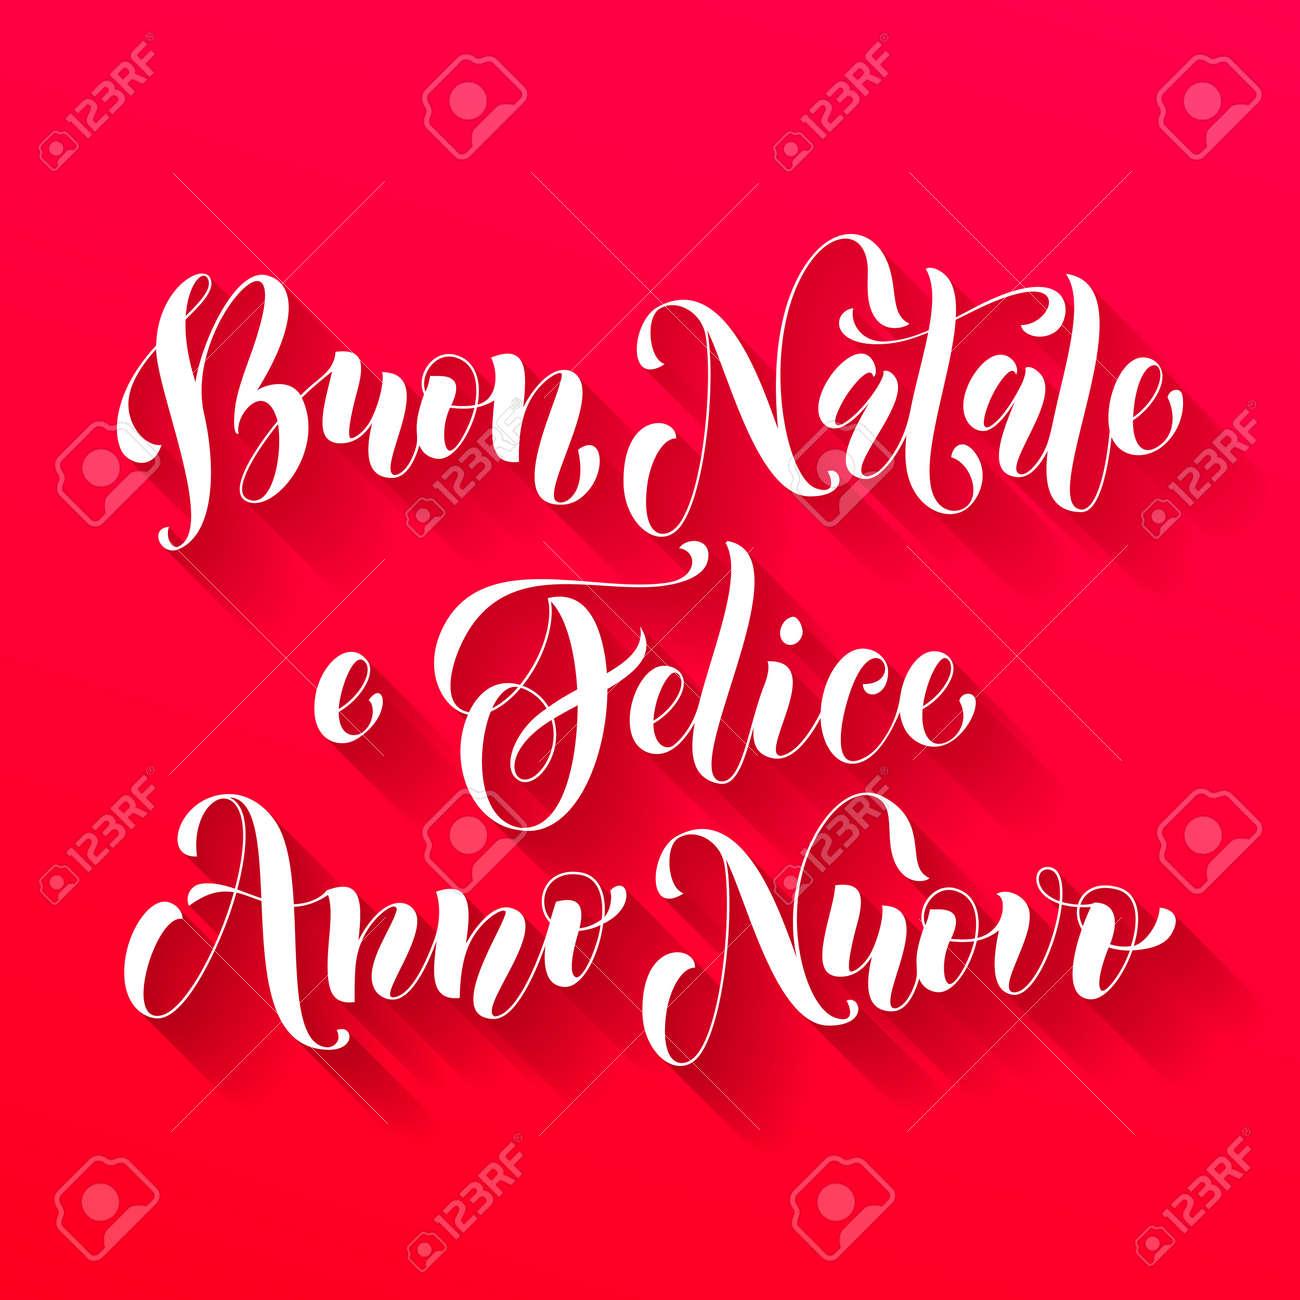 Carte Bonne Fete En Italien.Buon Natale Felice Anno Nuovo Salutation Italien Pour Joyeux Noel